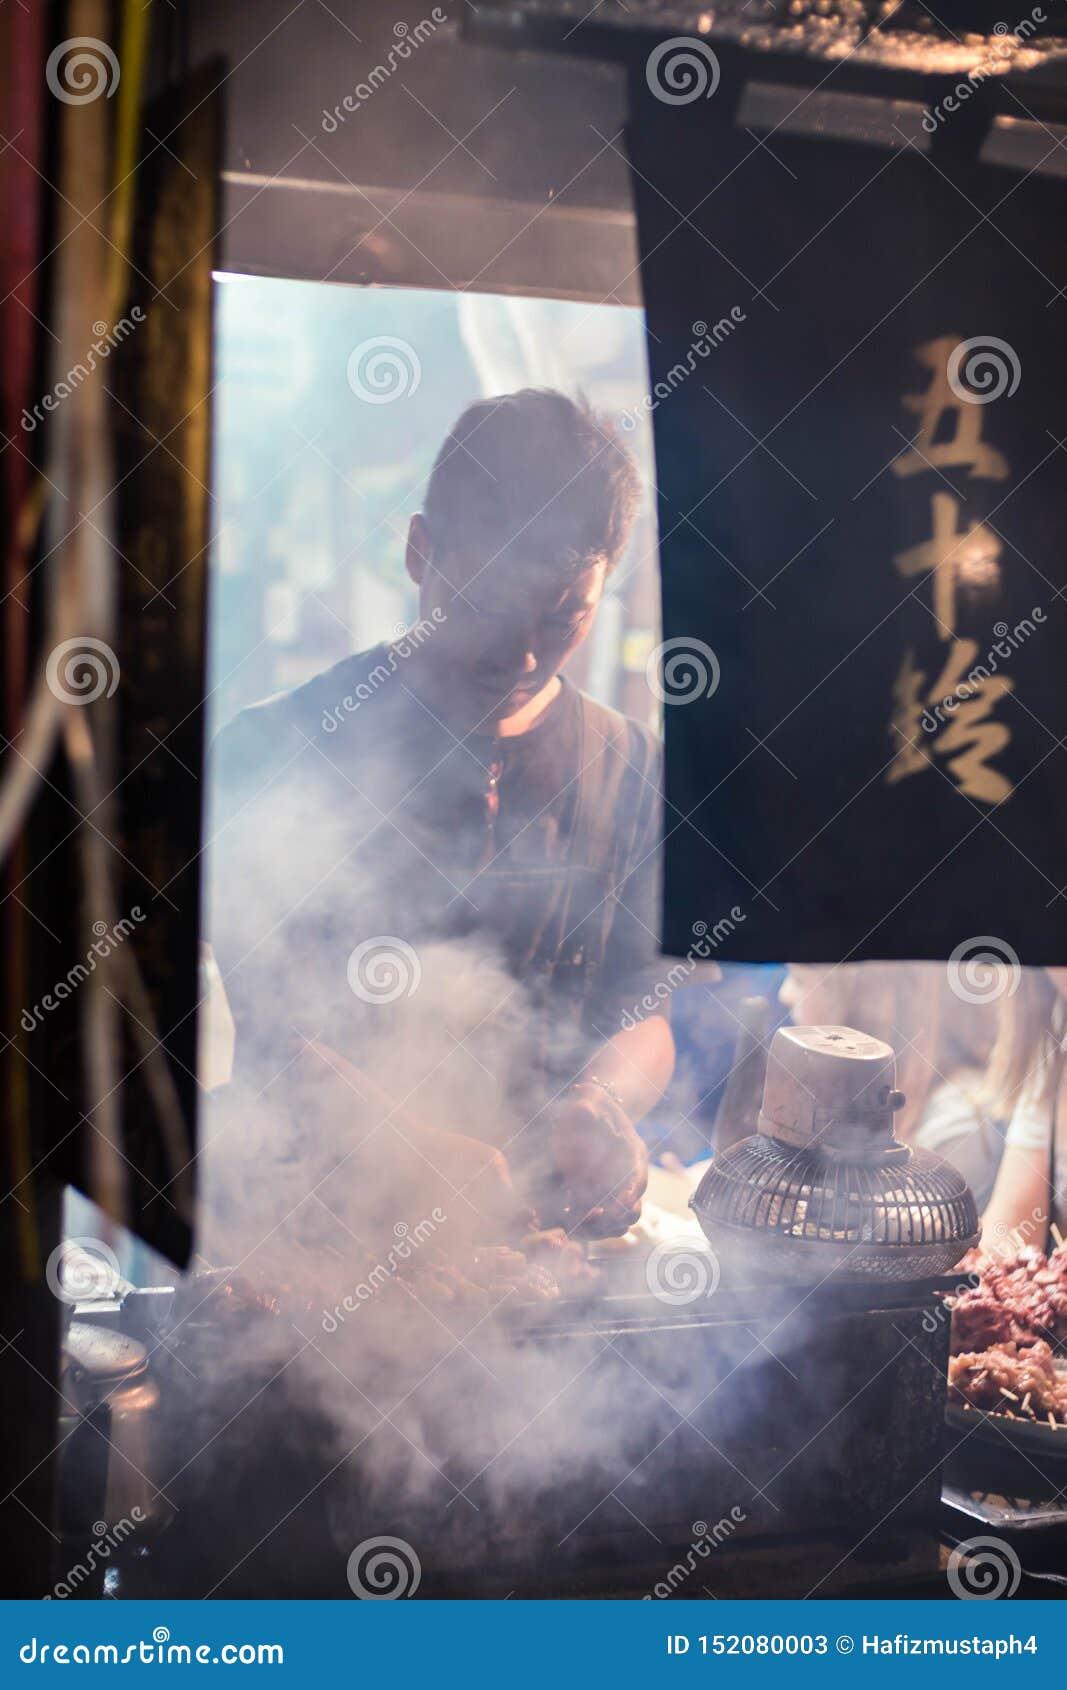 Worker of the restaurant preparing the food for the customer at traditional bar in Omoide Yokocho, Shinjuku. Portrait Orientation